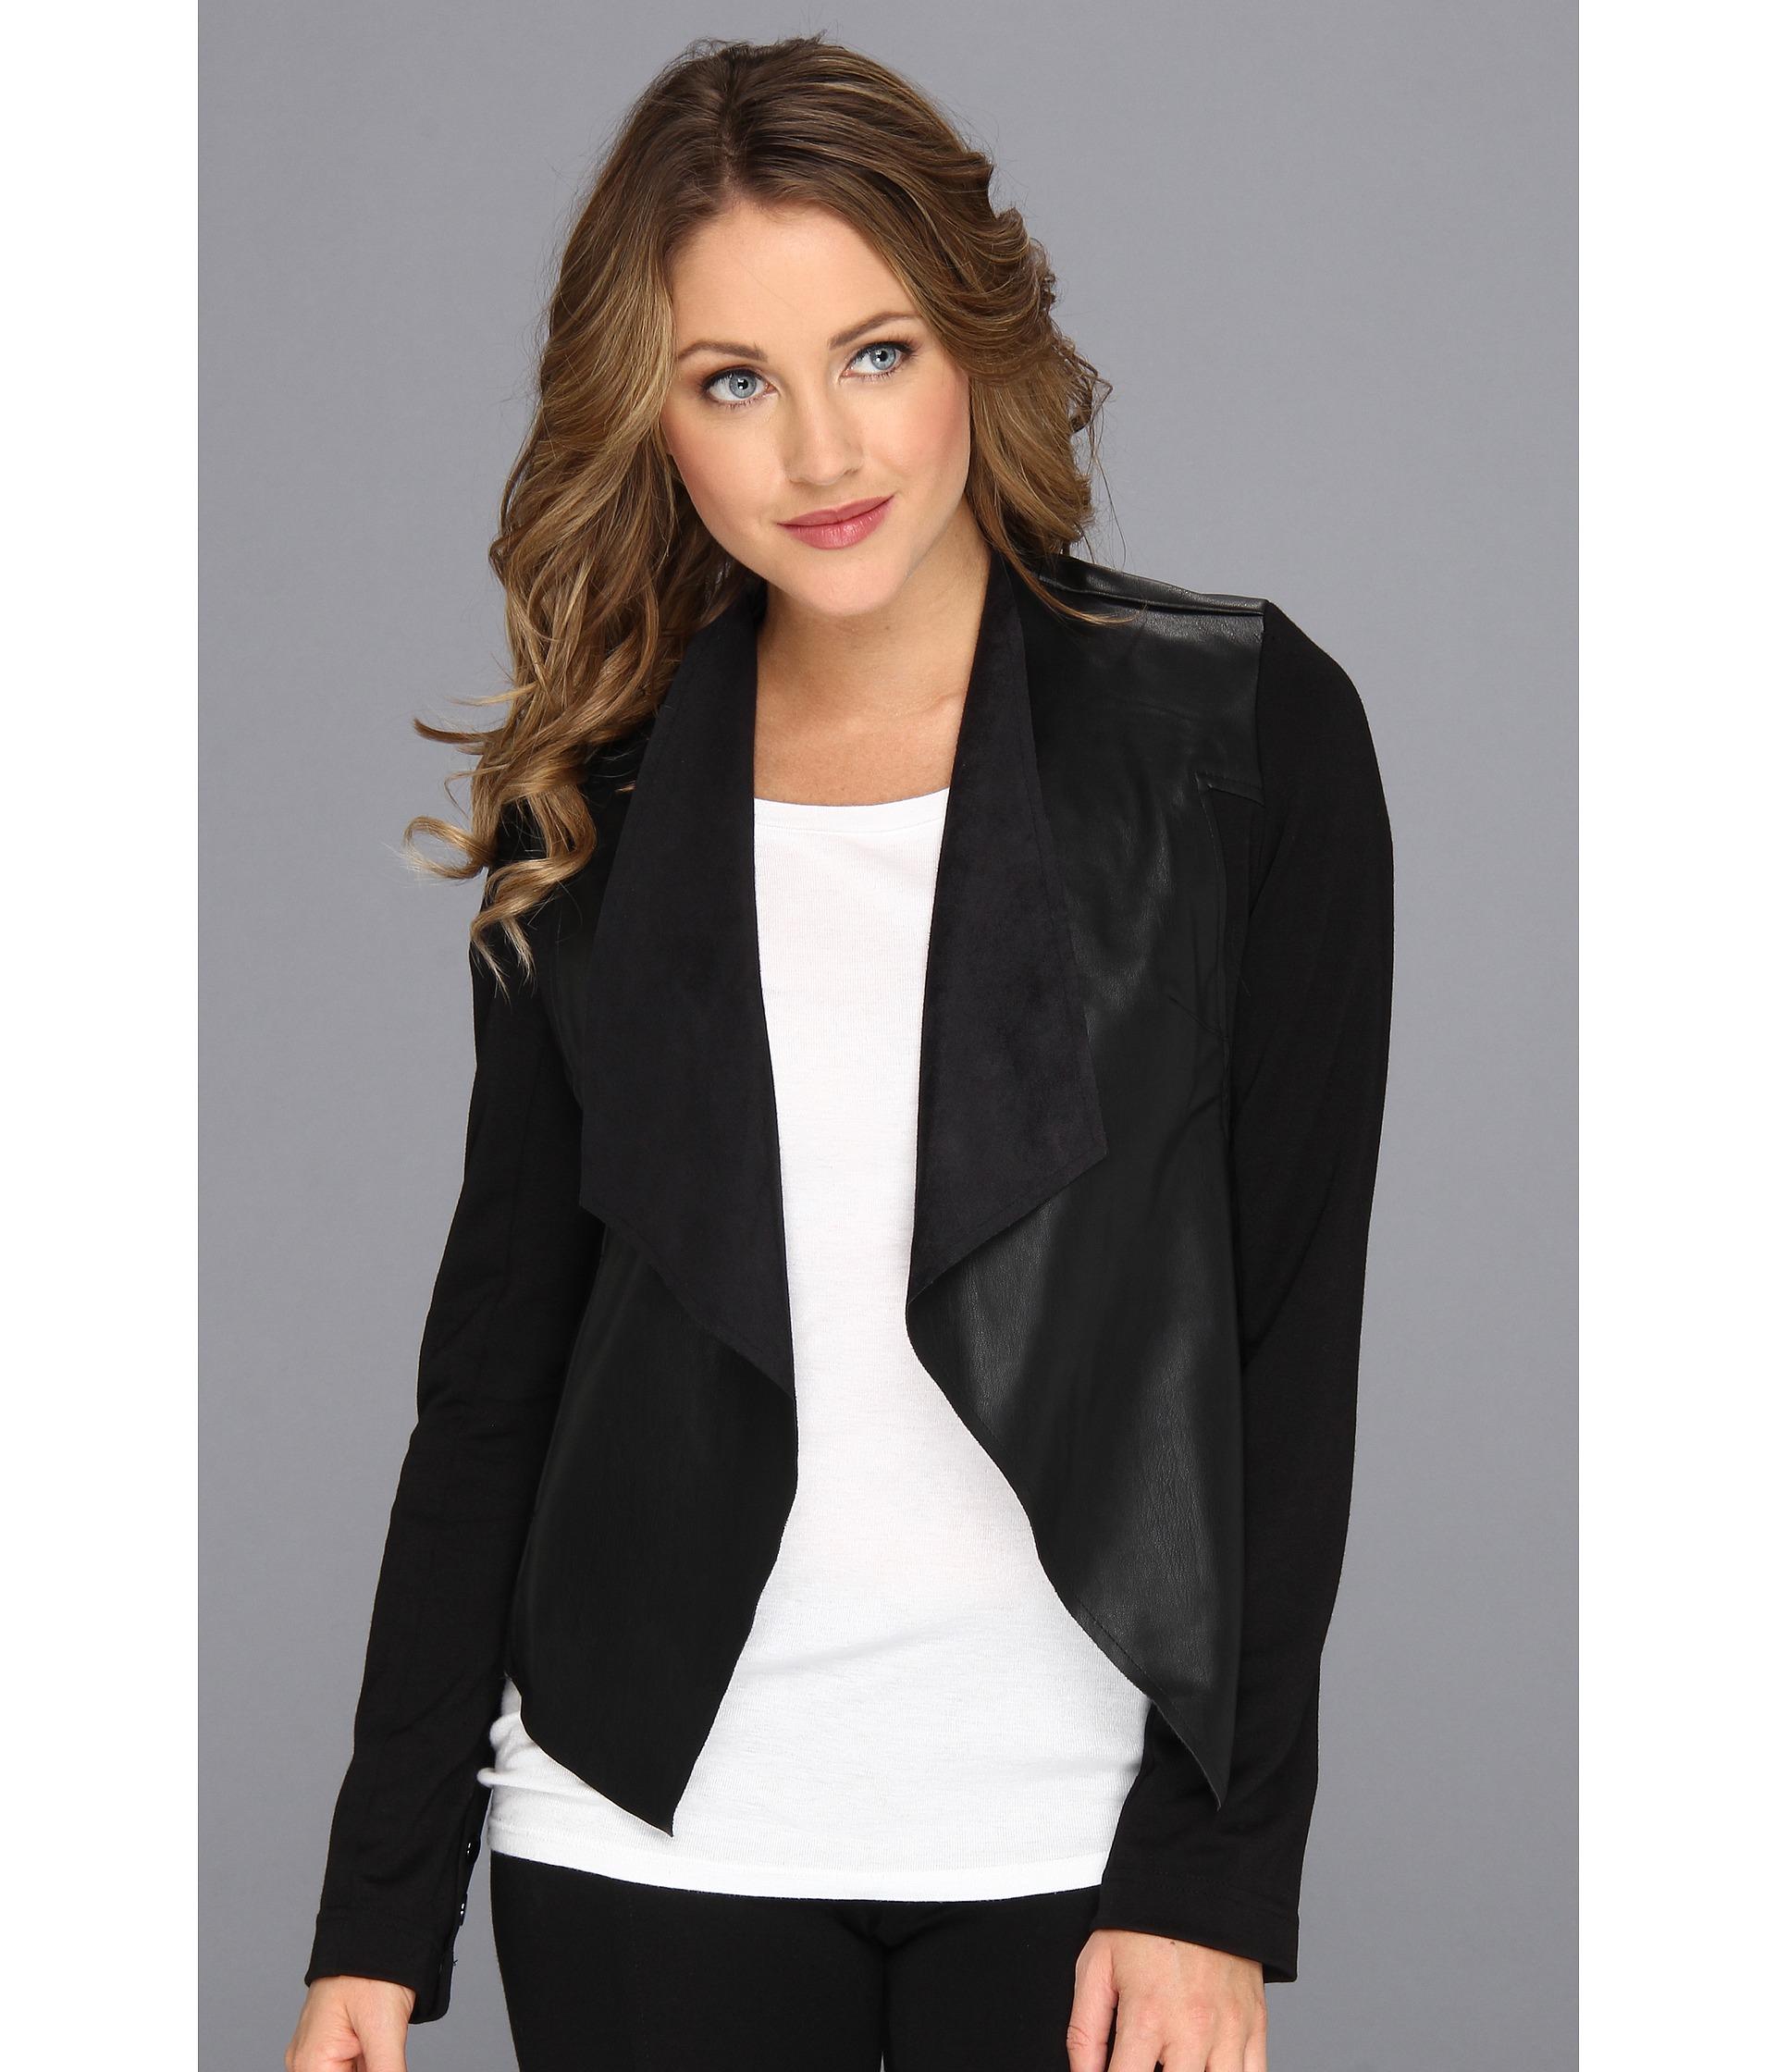 g jacket zip page faux gili front leather i qvc peplum drapes l drape product com